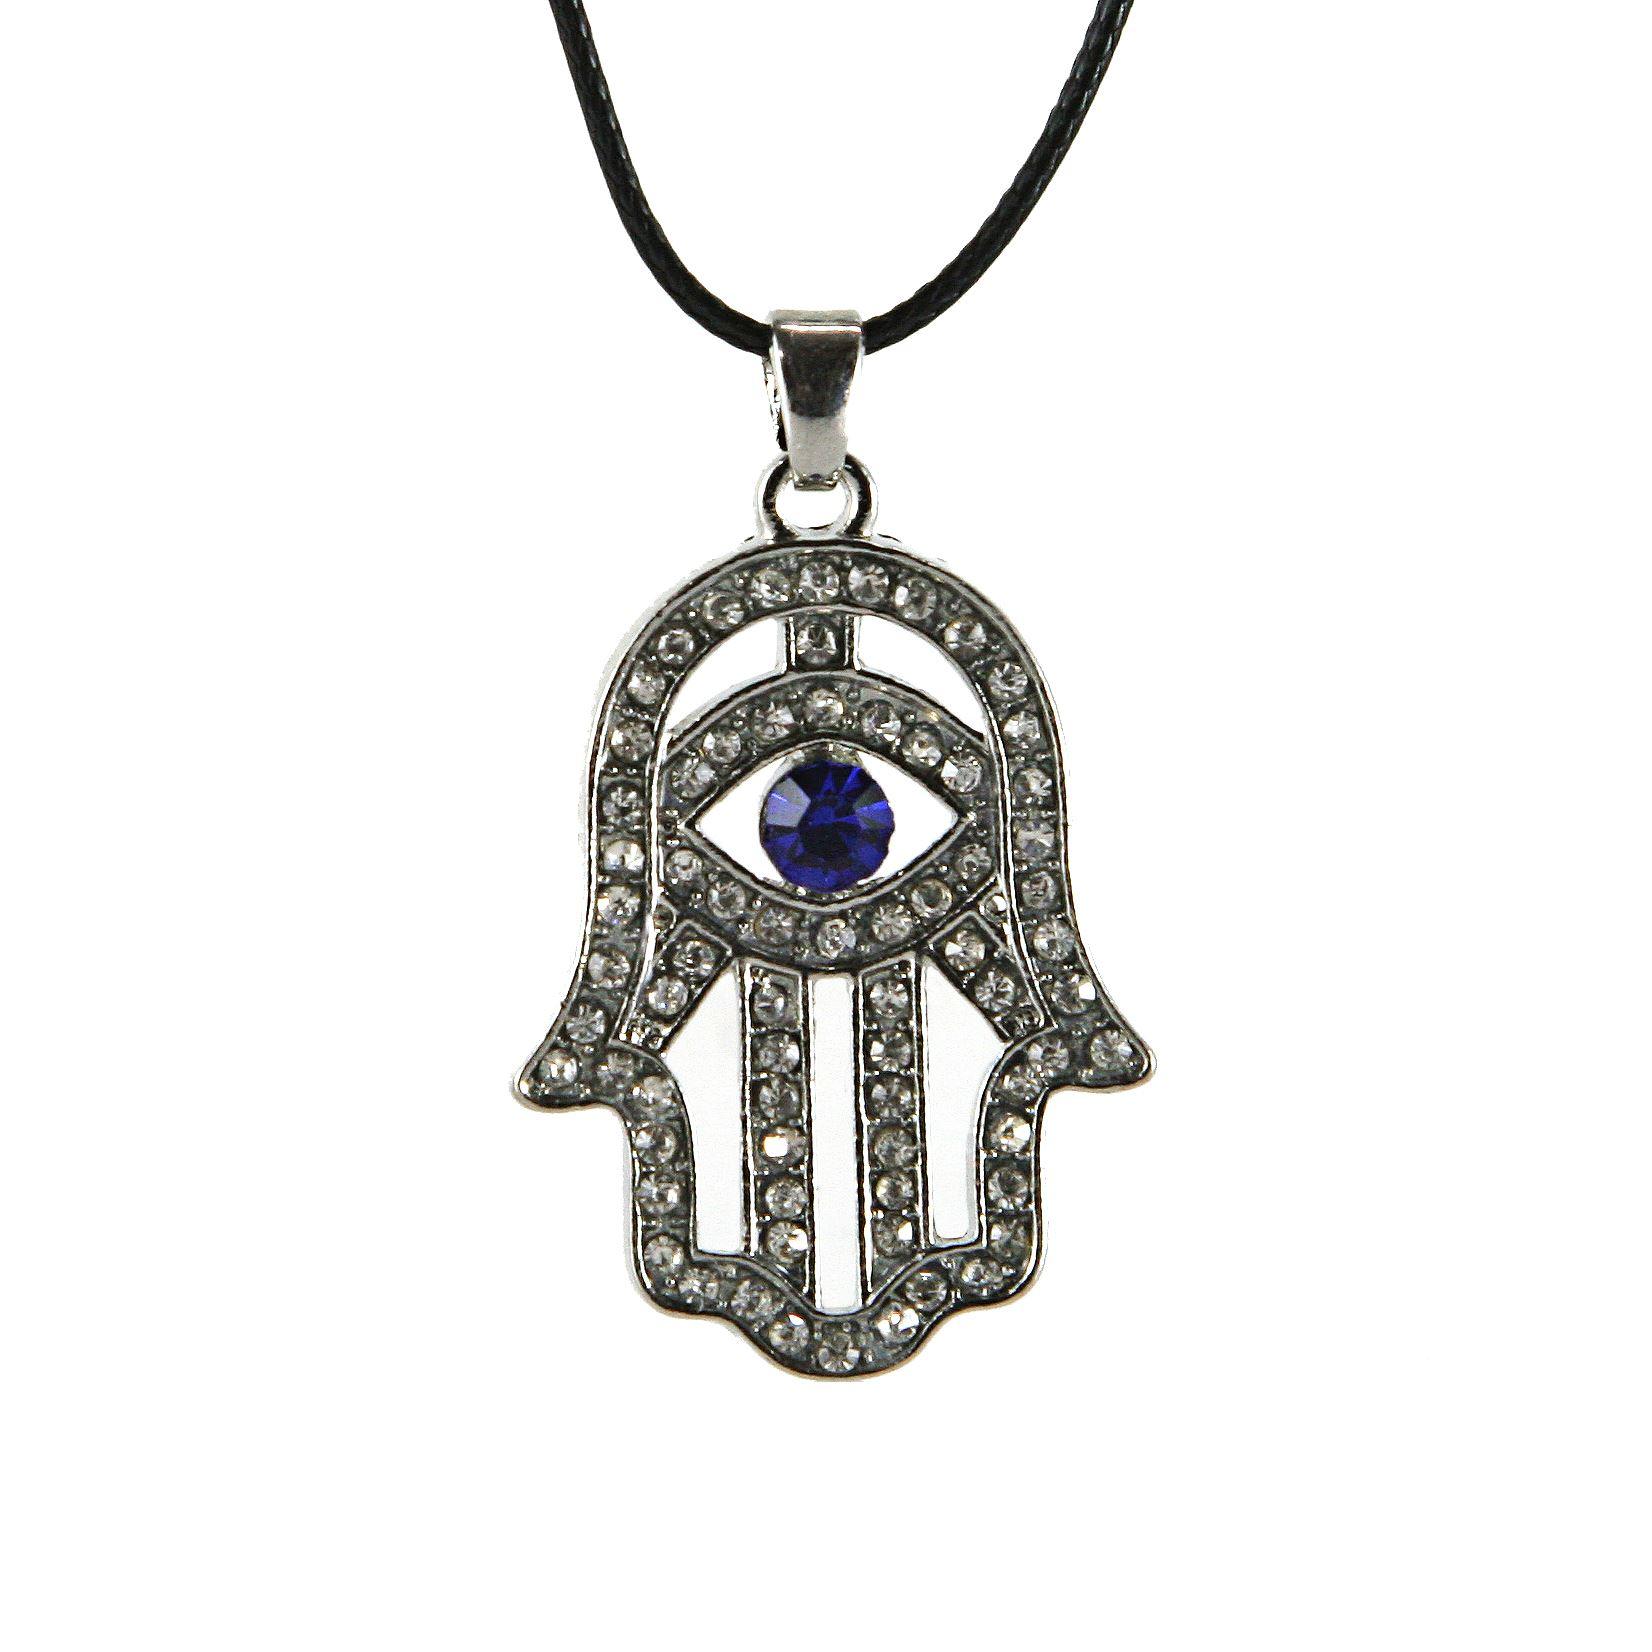 New Hamsa Necklace lucky charm Silver Plated Pendant Jewish Judaica Kabbalah